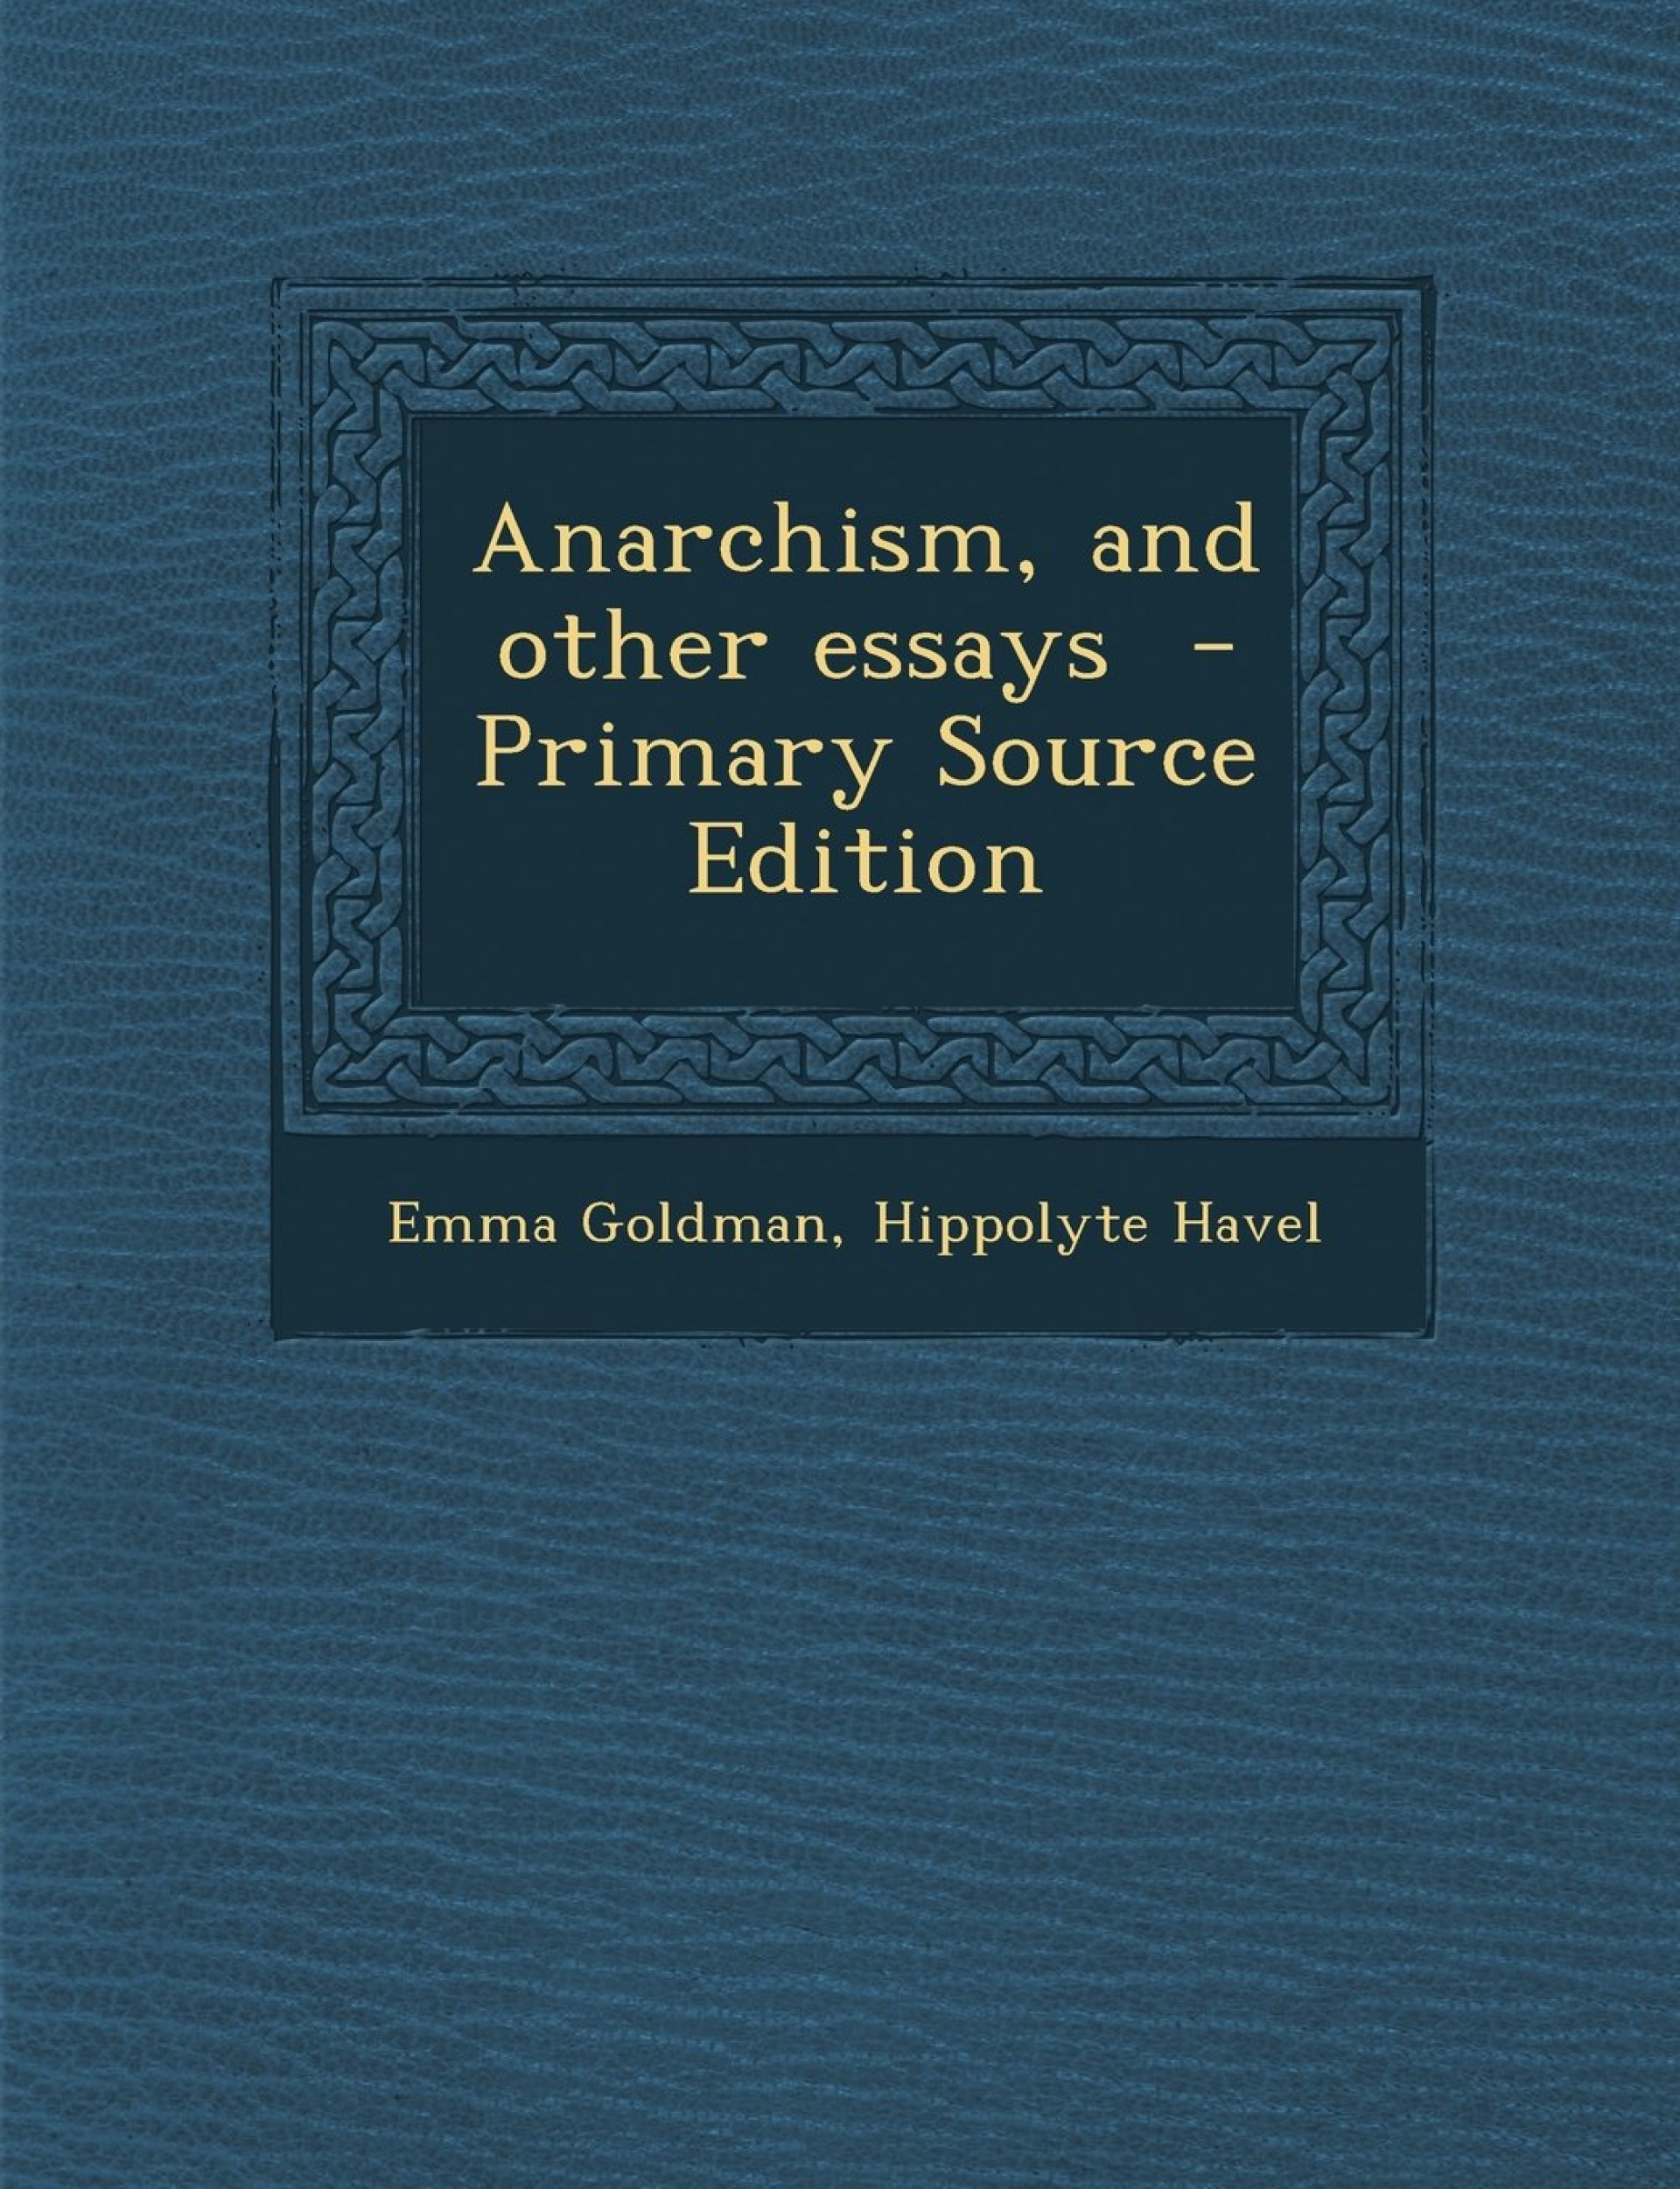 011 Essay Example 81cxvi Vkbl Anarchism And Other Incredible Essays Emma Goldman Summary Pdf 1920